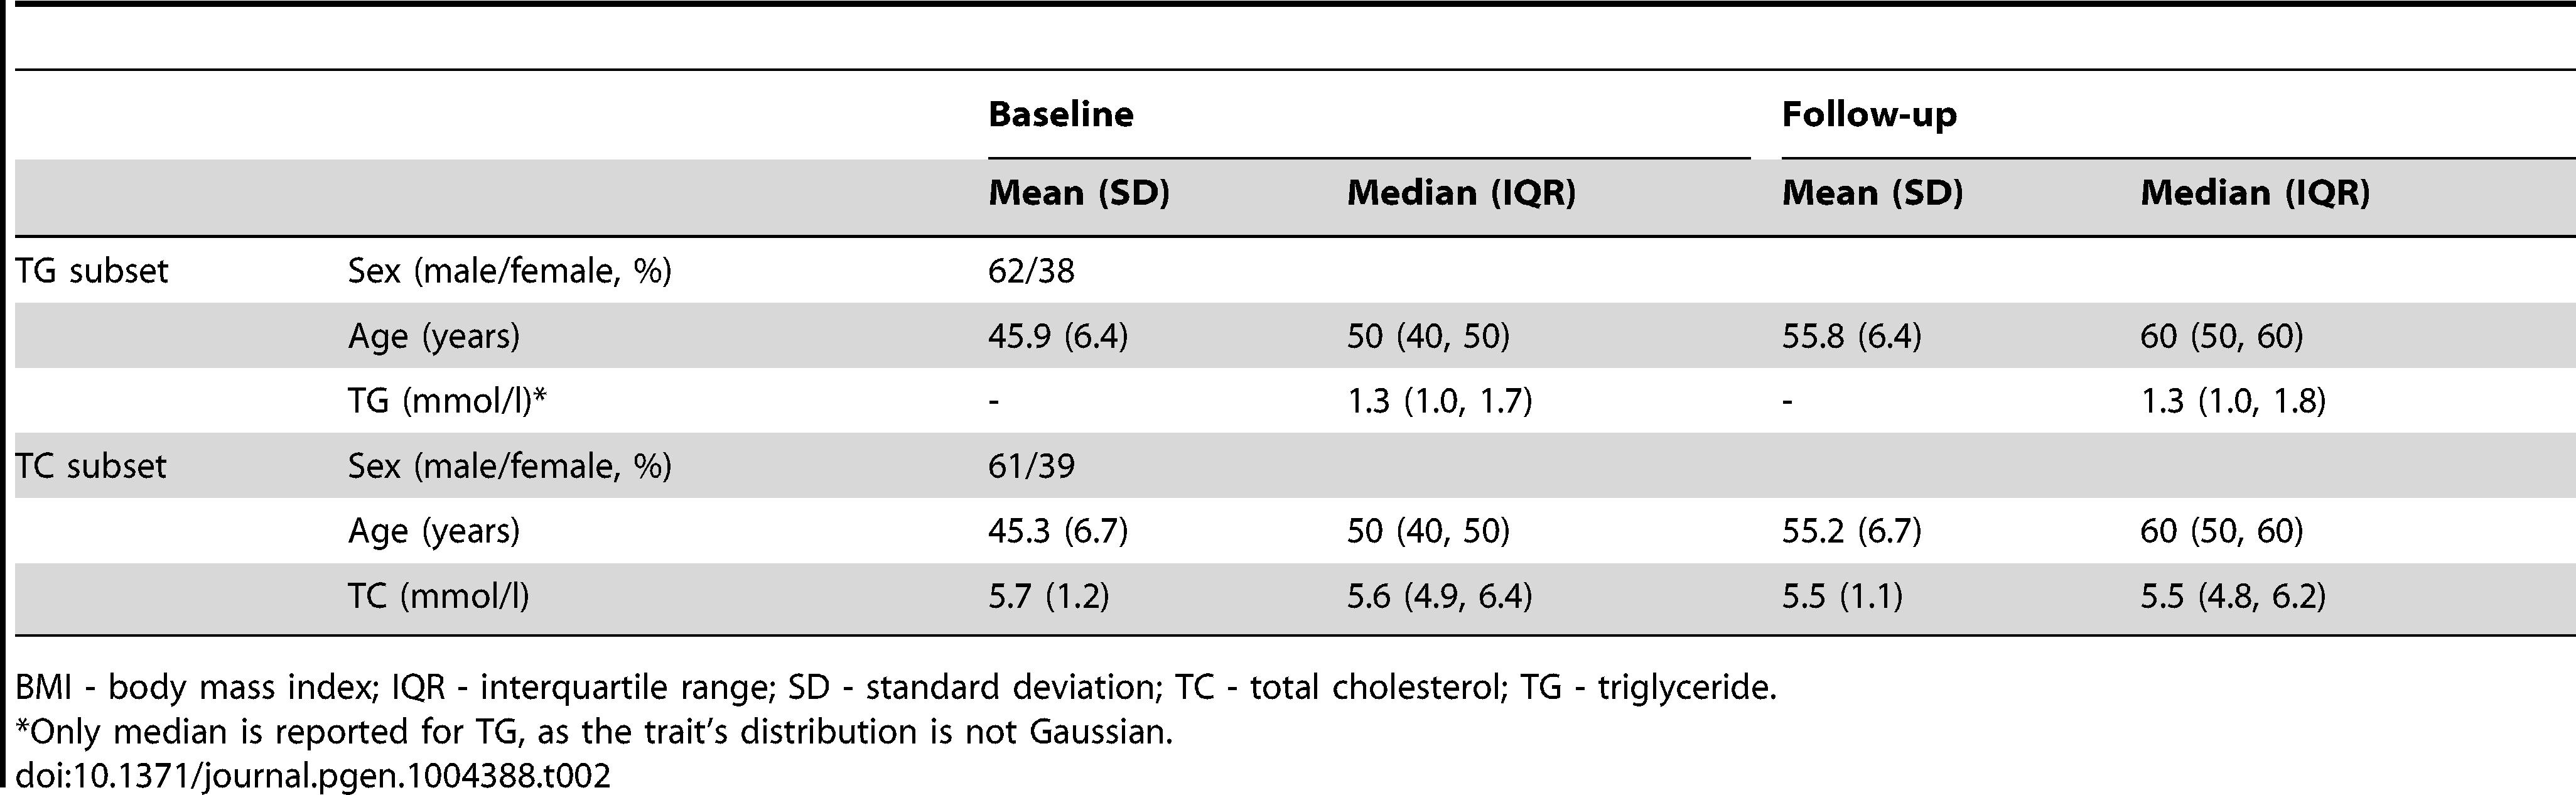 Longitudinal characteristics of the GLACIER Study participants (N=3,495 for TC; N=2,211 for TG).